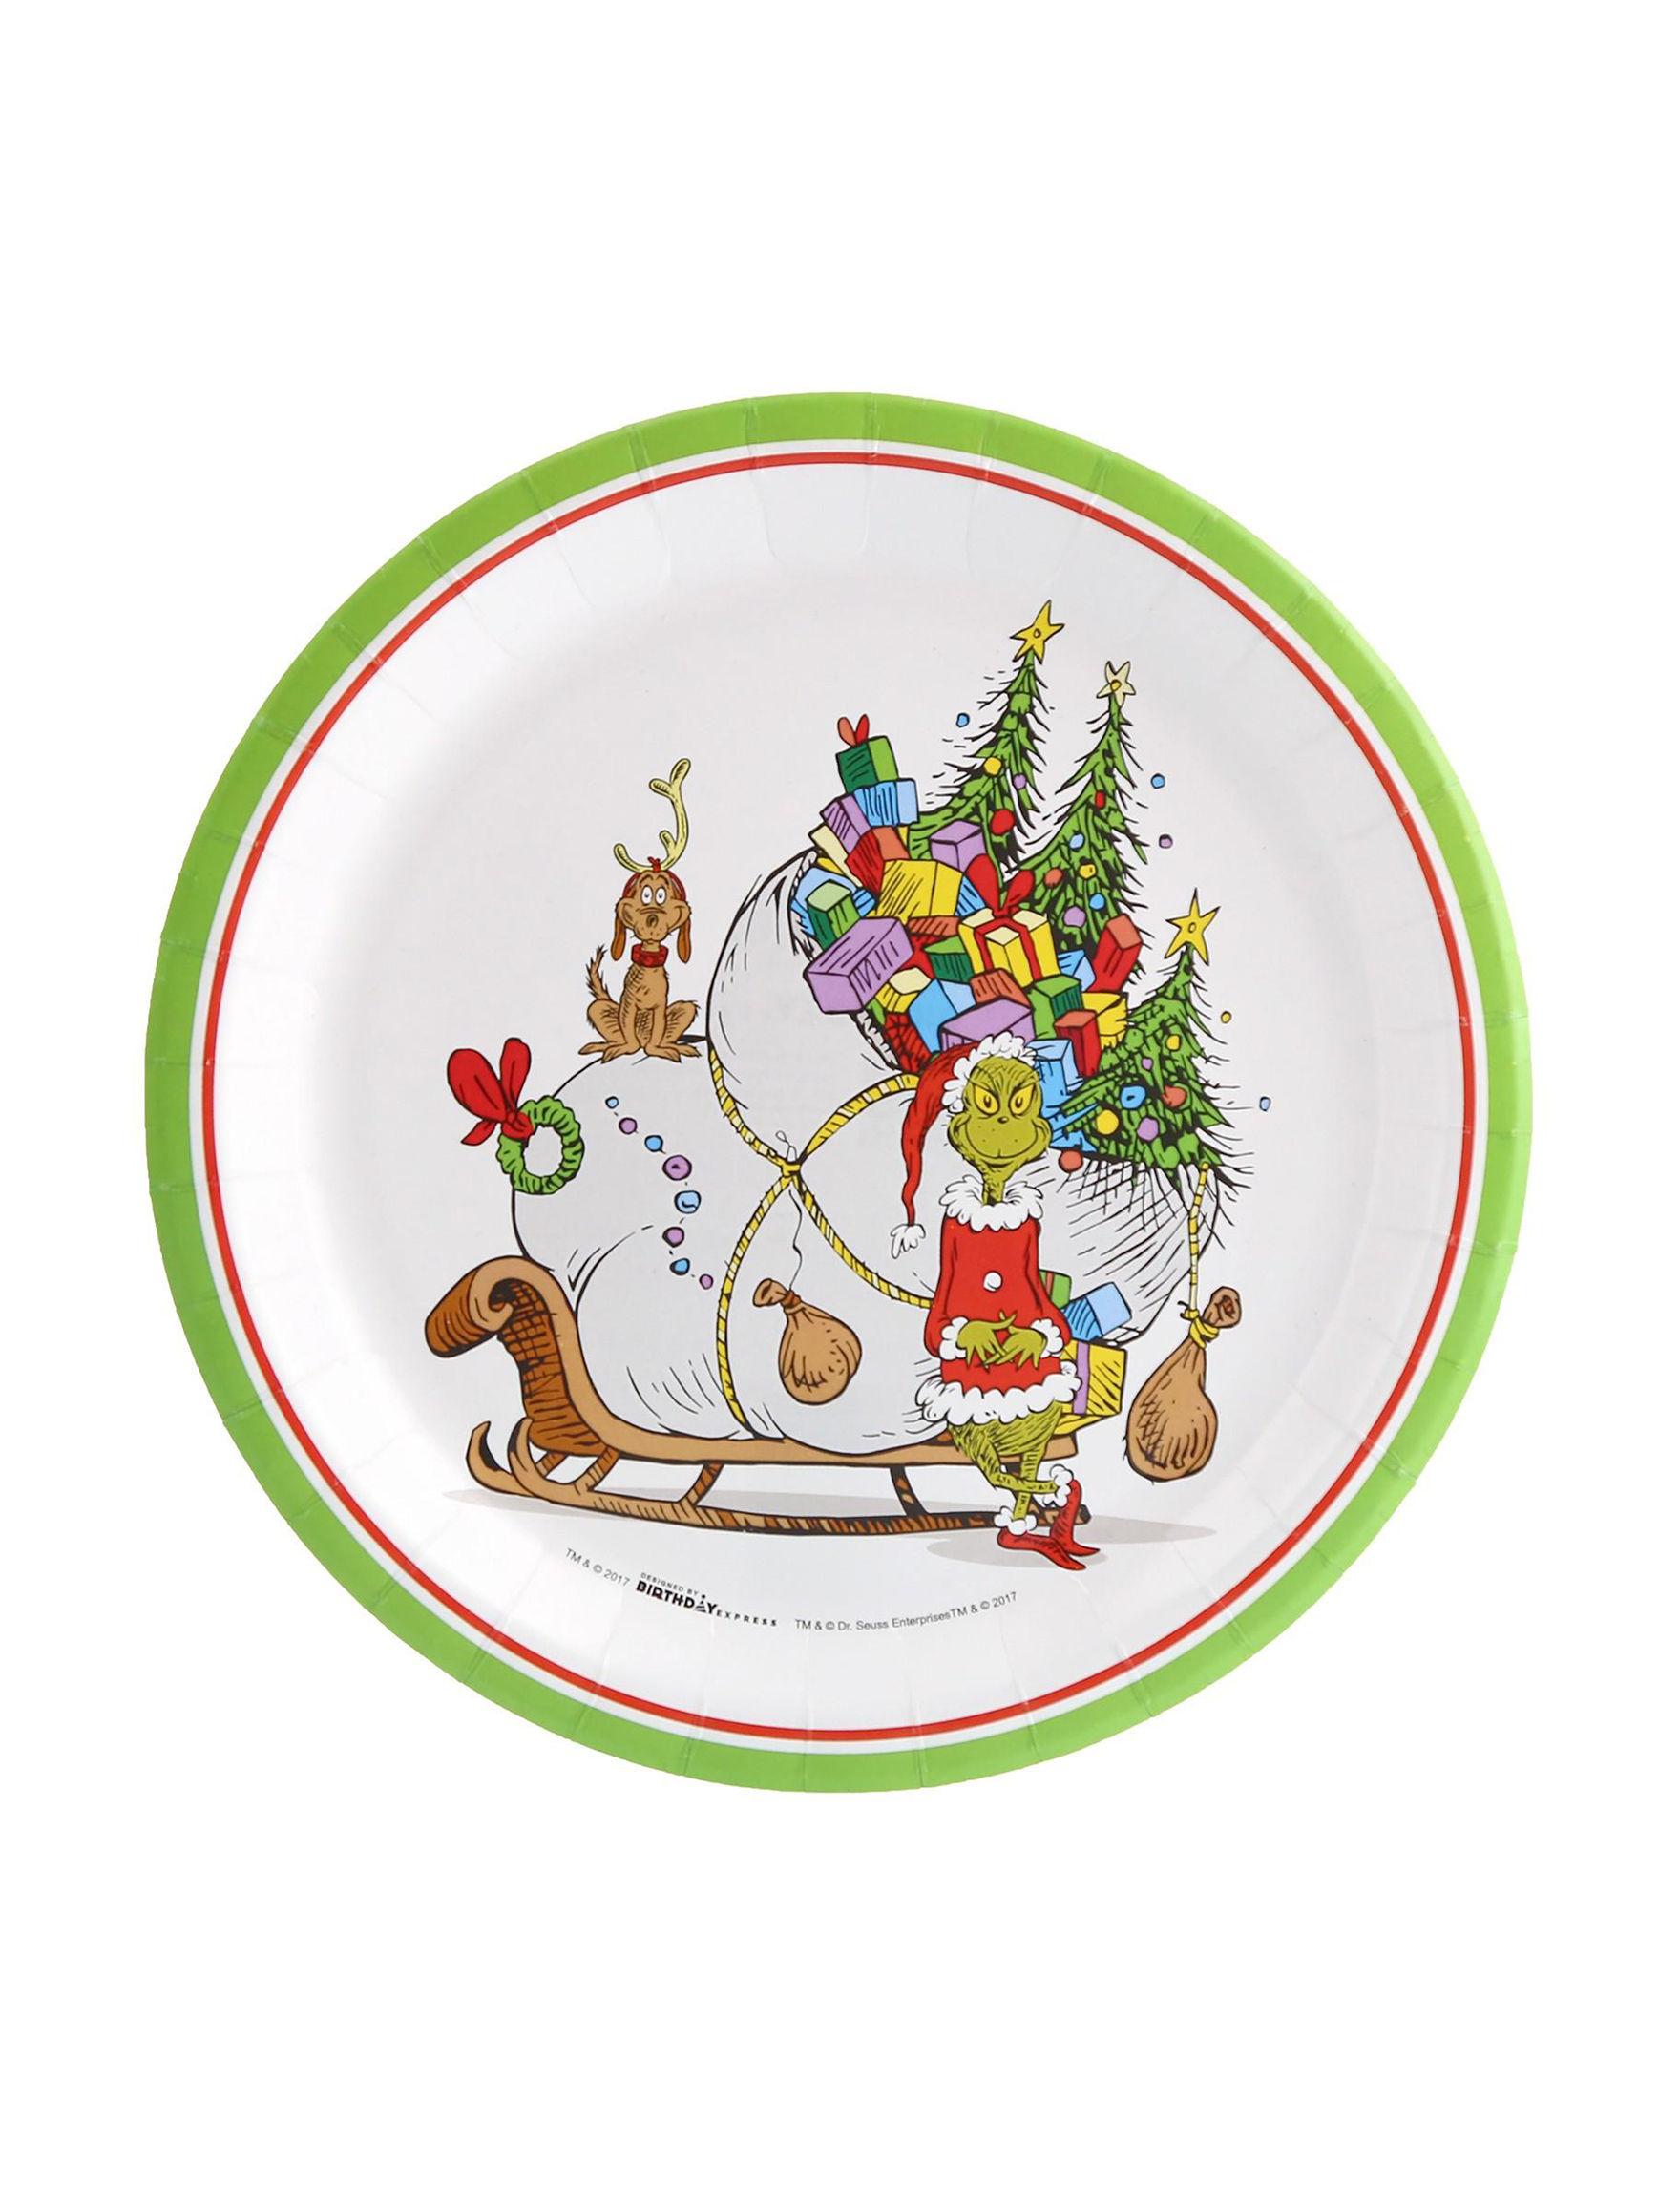 BuySeasons White Multi Decorative Objects Holiday Dining u0026 Entertaining Holiday Decor Serveware  sc 1 st  Stage Stores & 8-pk. Dr. Seussu0027s